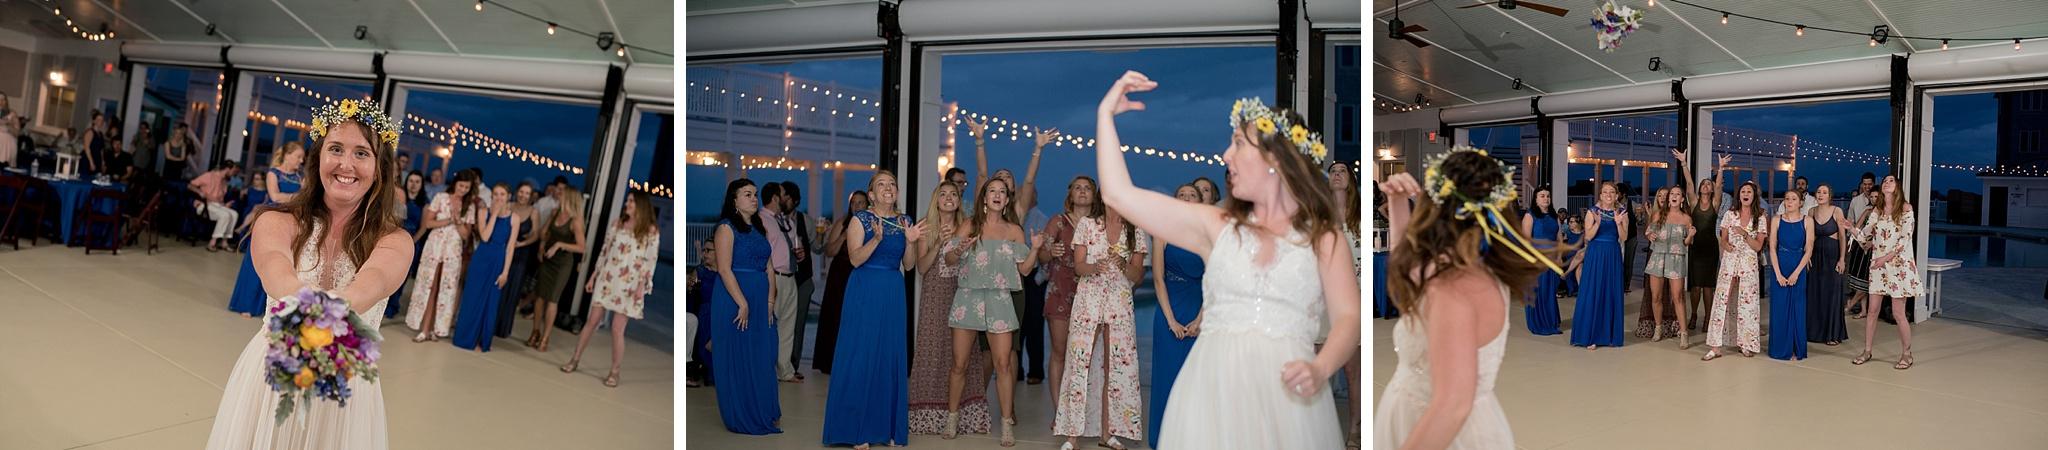 Avon-NC-Wedding-Photographer-228.jpg